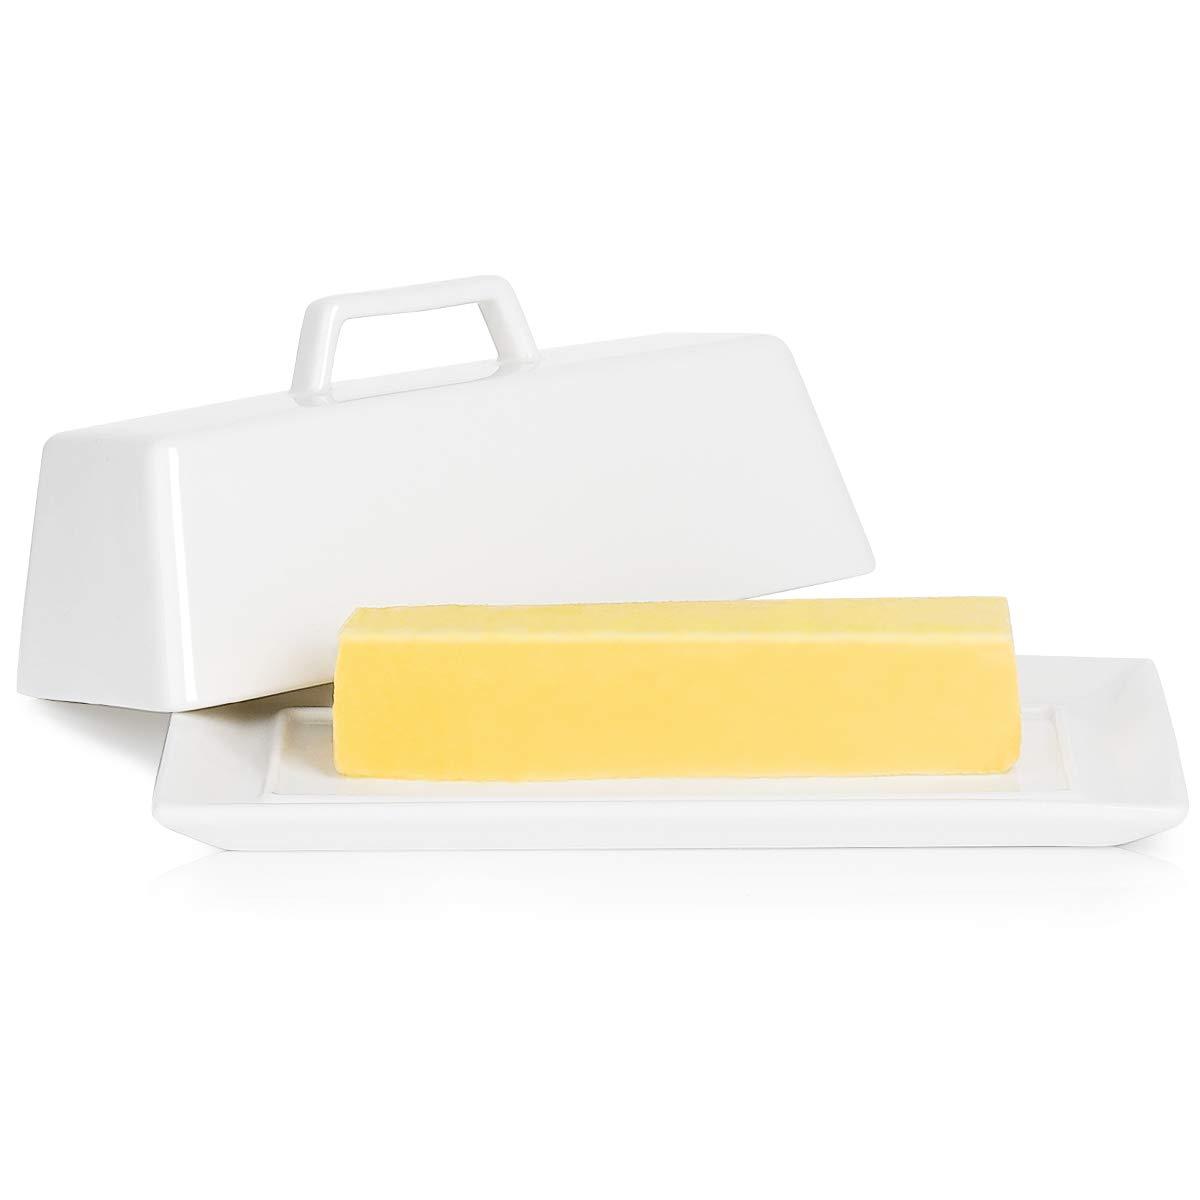 Porcelain Butter Dish with Lid, Covered Butter Keeper - Handle Design - Dishwasher Safe, White - Better Butter & Beyond